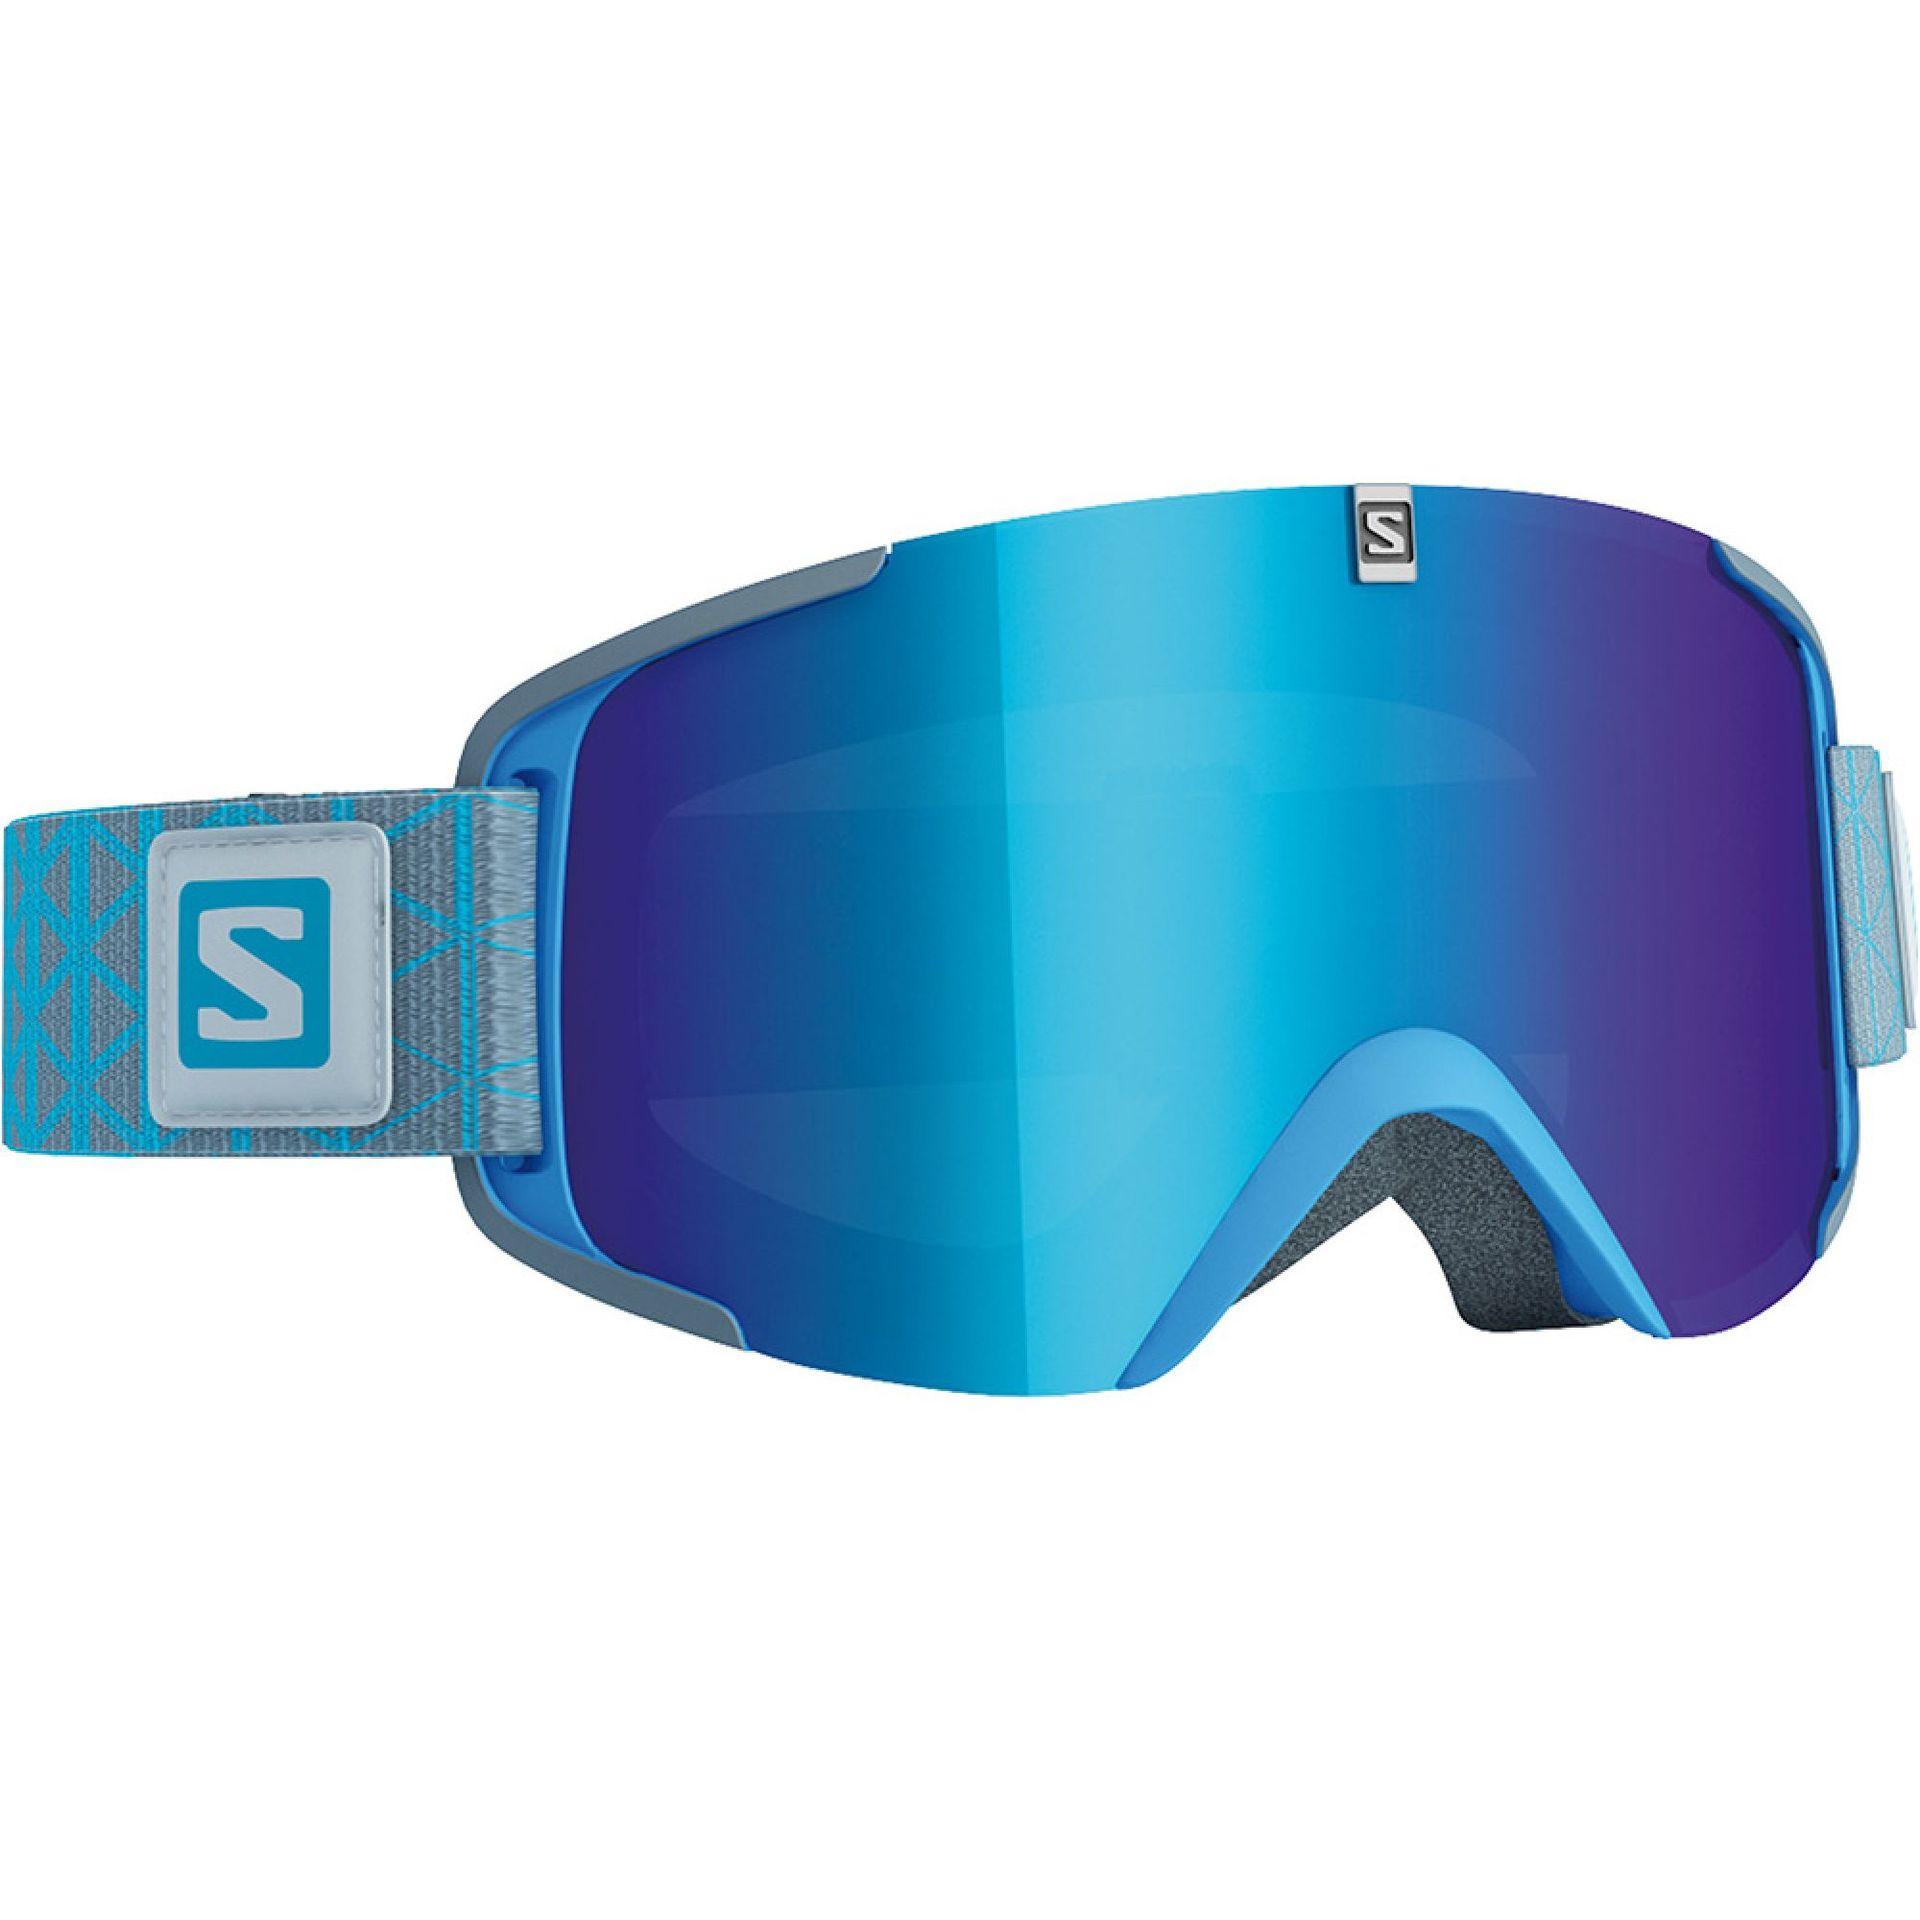 GOGLE SALOMON X VIEW EXTRA BLUE|SOLAR BLUE 0